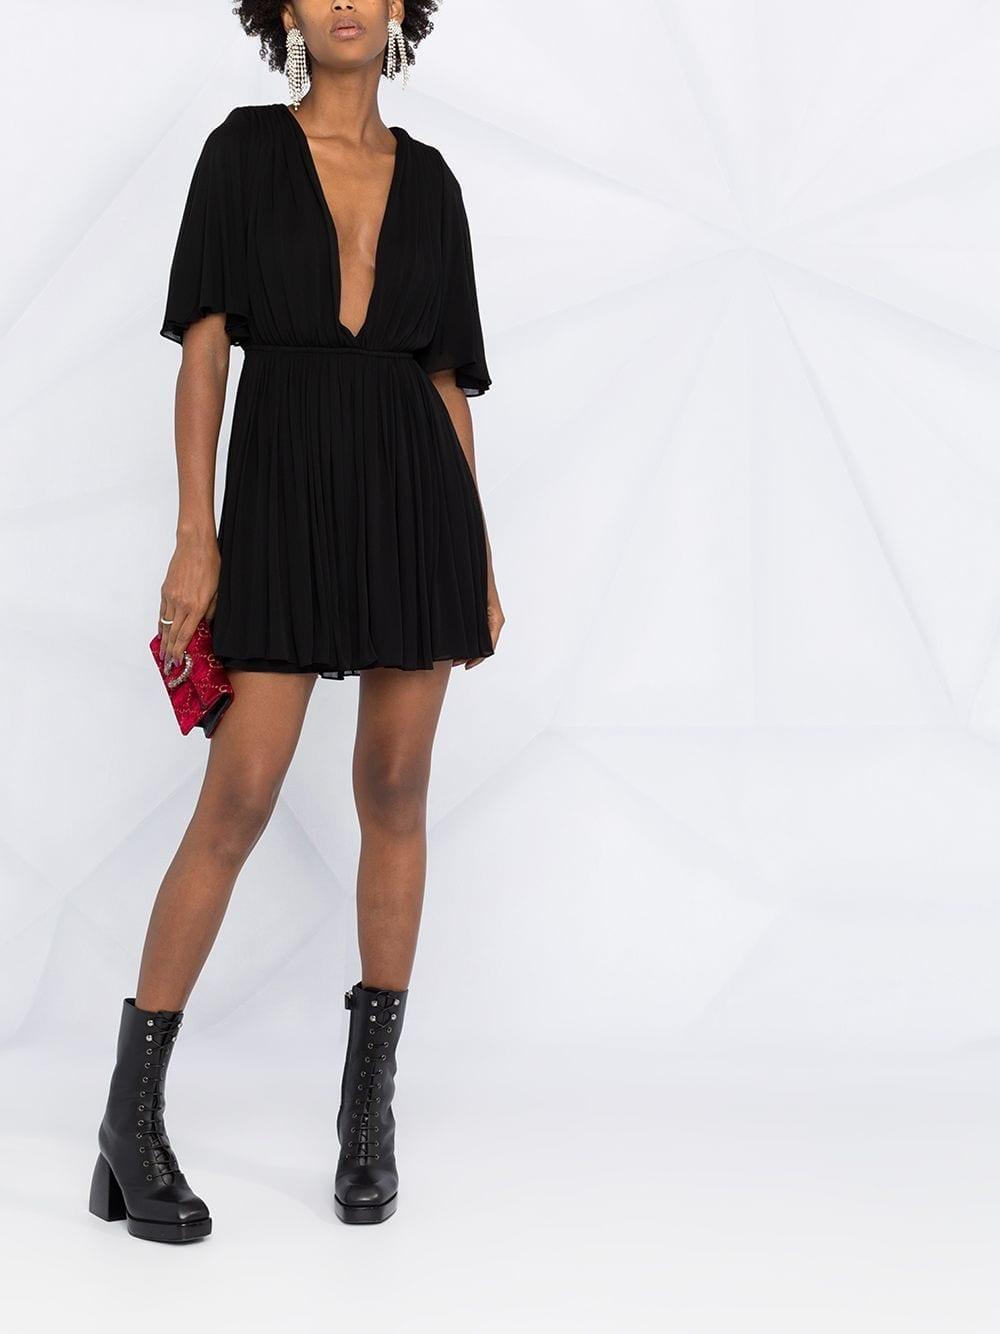 SAINT LAURENT Plunging-neck Flared Dress